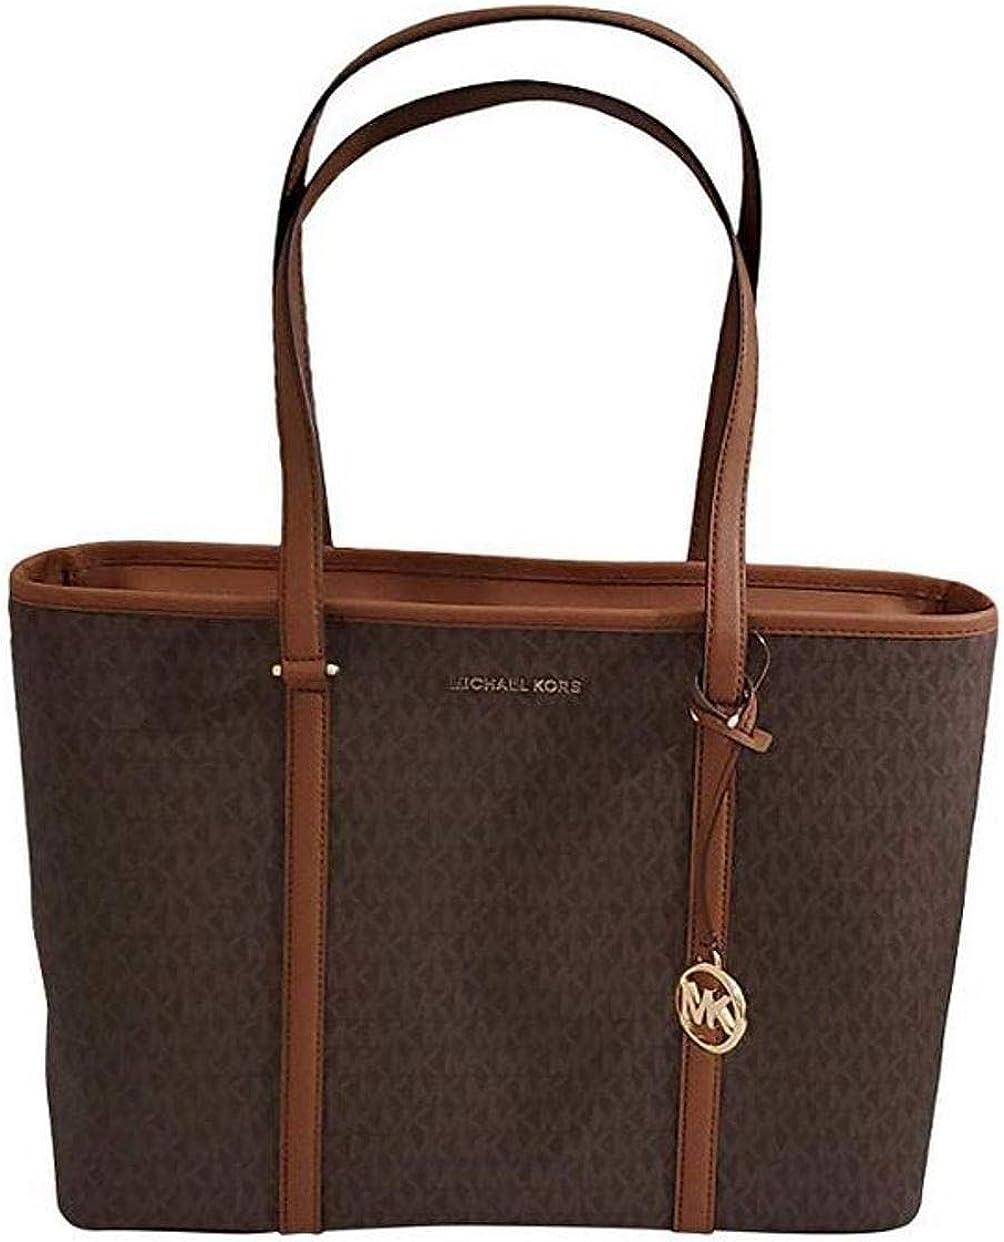 Michael Kors Women s Sady Carryall Shoulder Bag